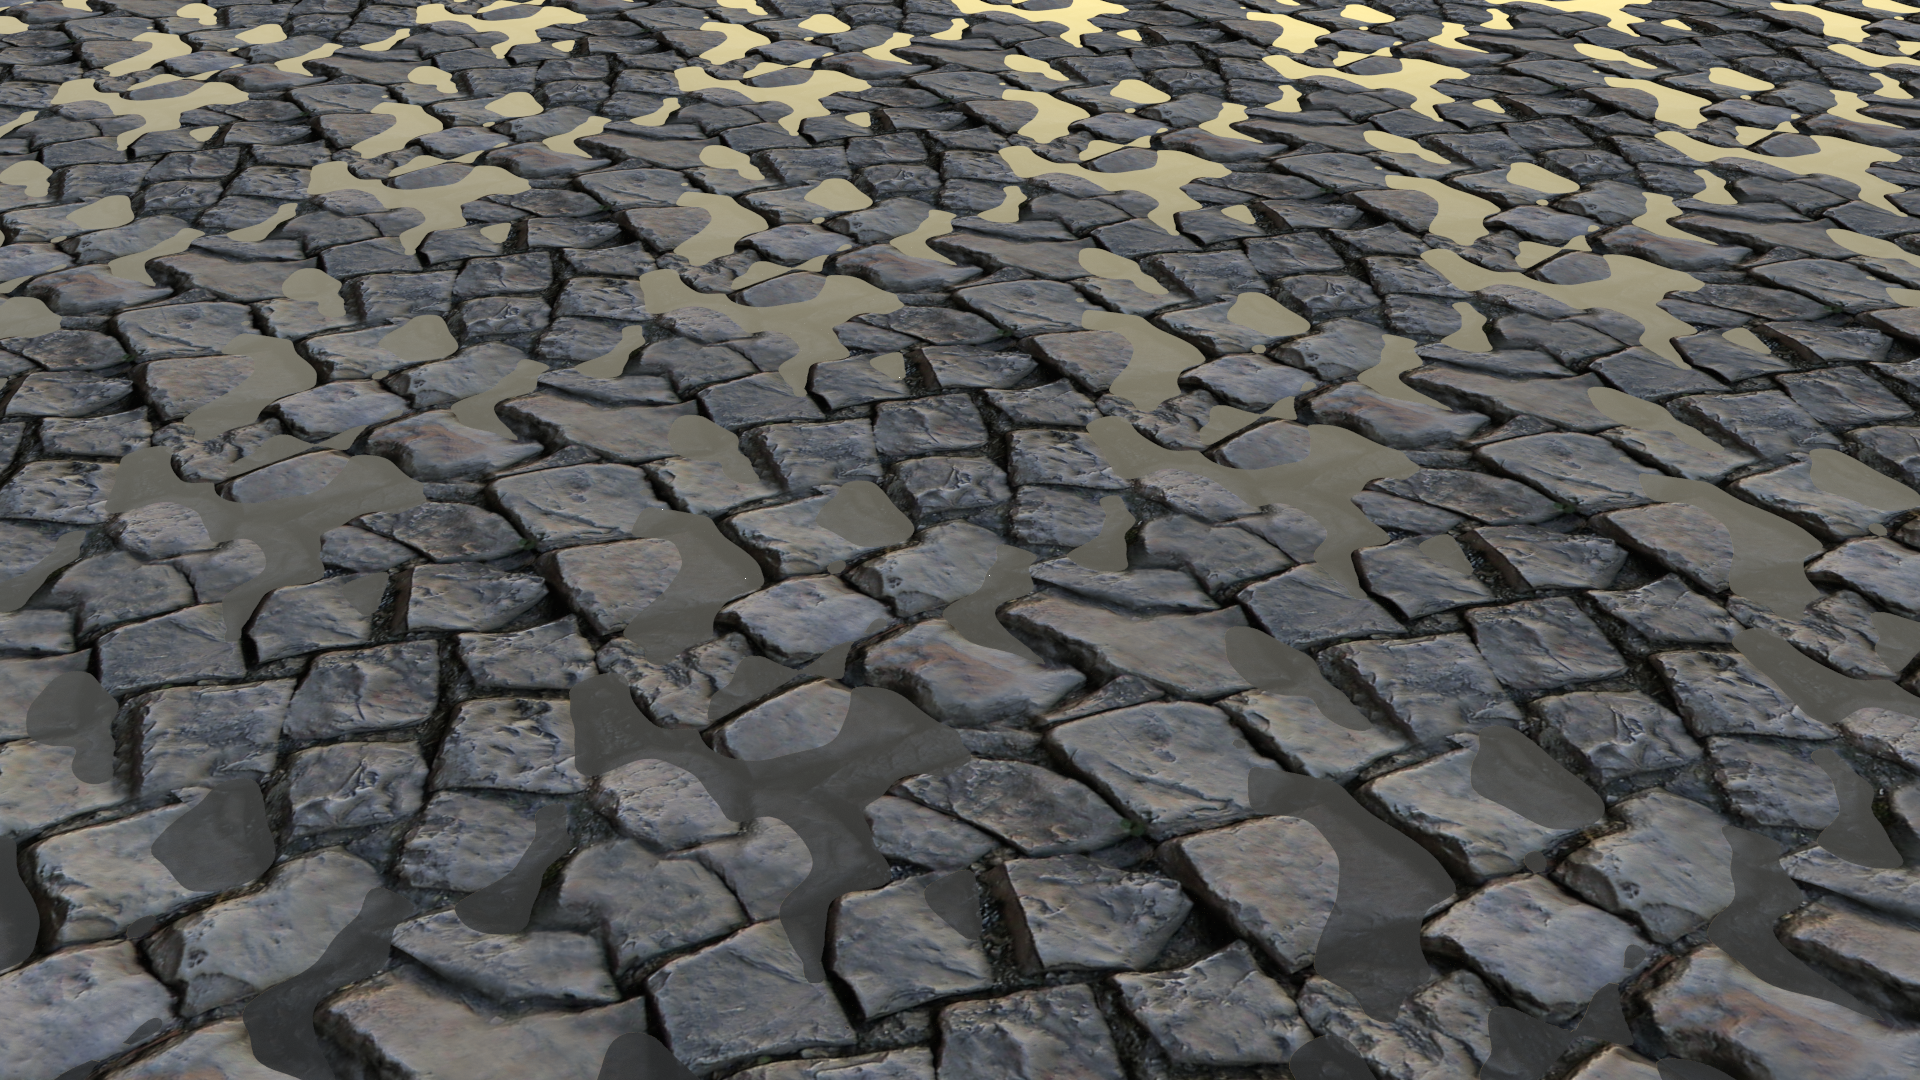 cobblestone with water by Shinkira on DeviantArt